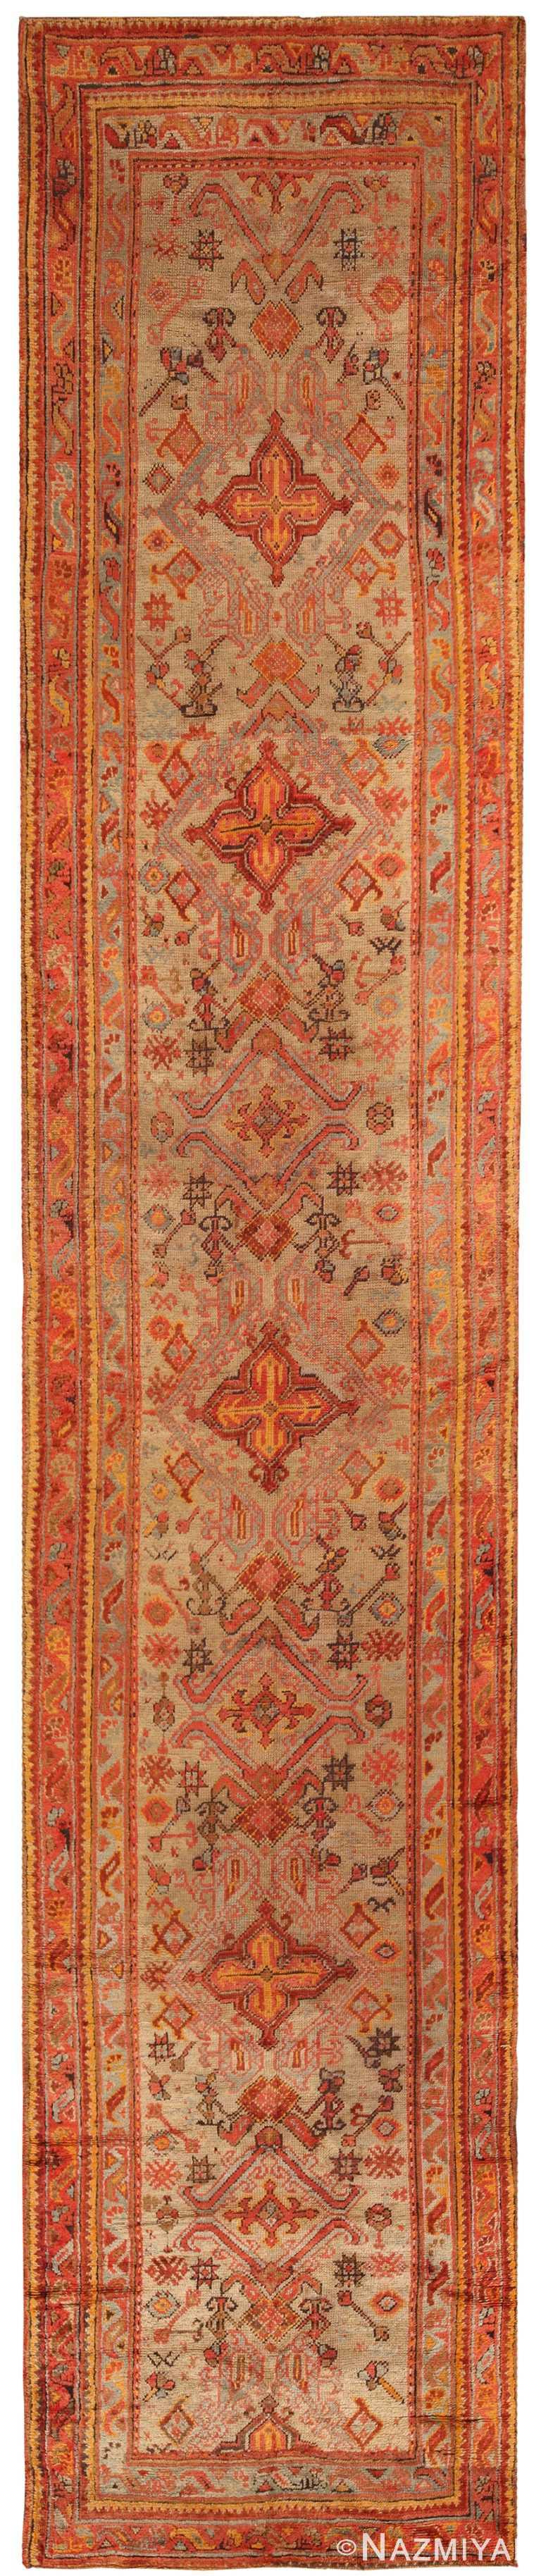 Antique Turkish Oushak Runner Rug 70276 by Nazmiyal NYC